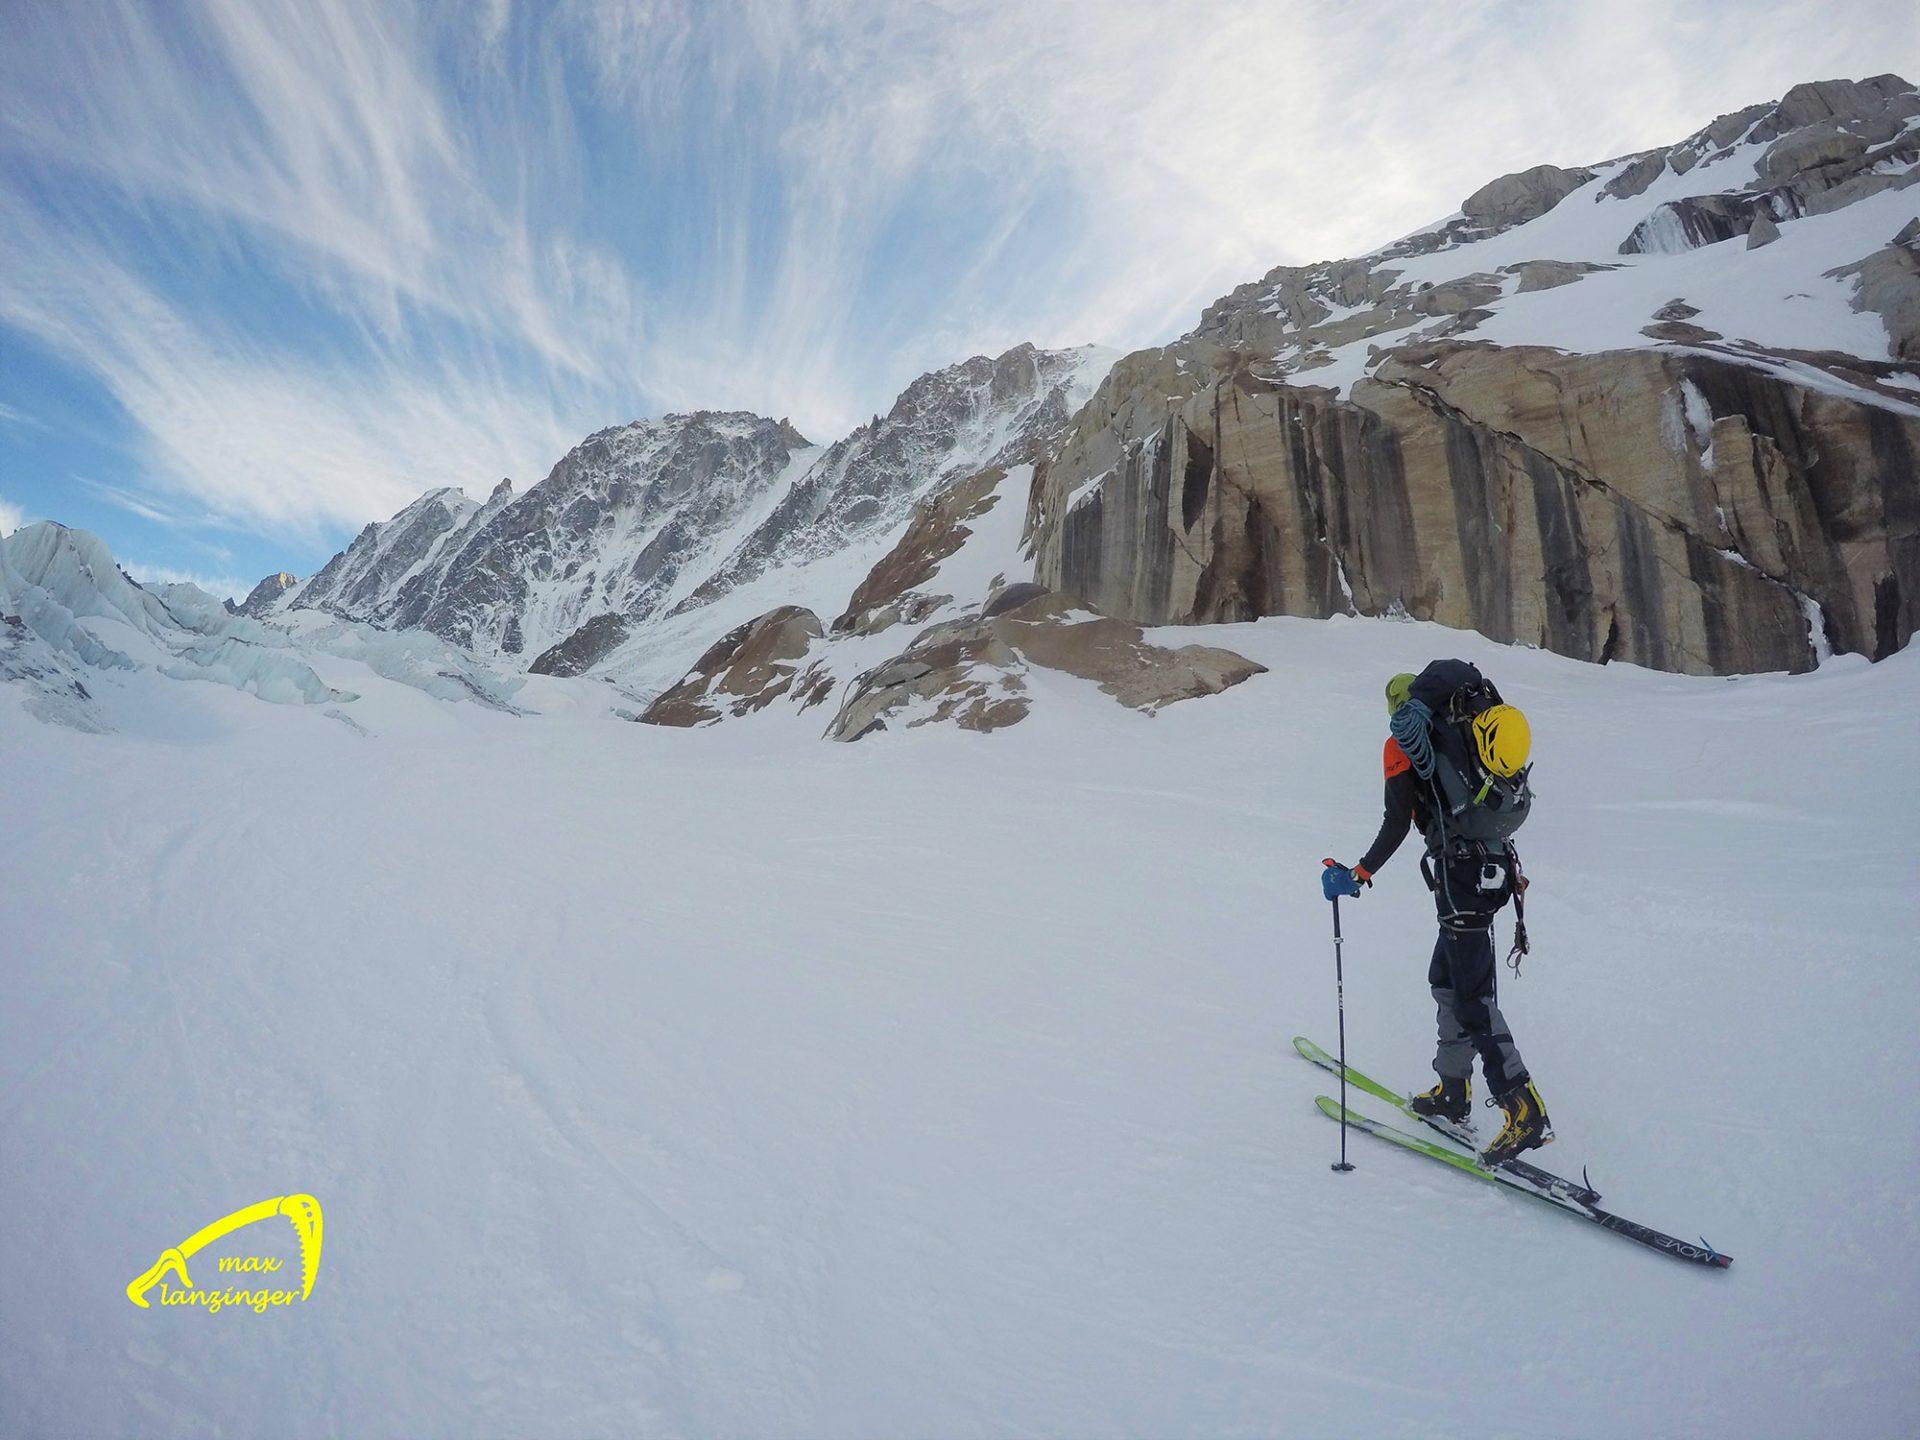 Les Droites Nordwand Chamonix(c)MaxLanzinger